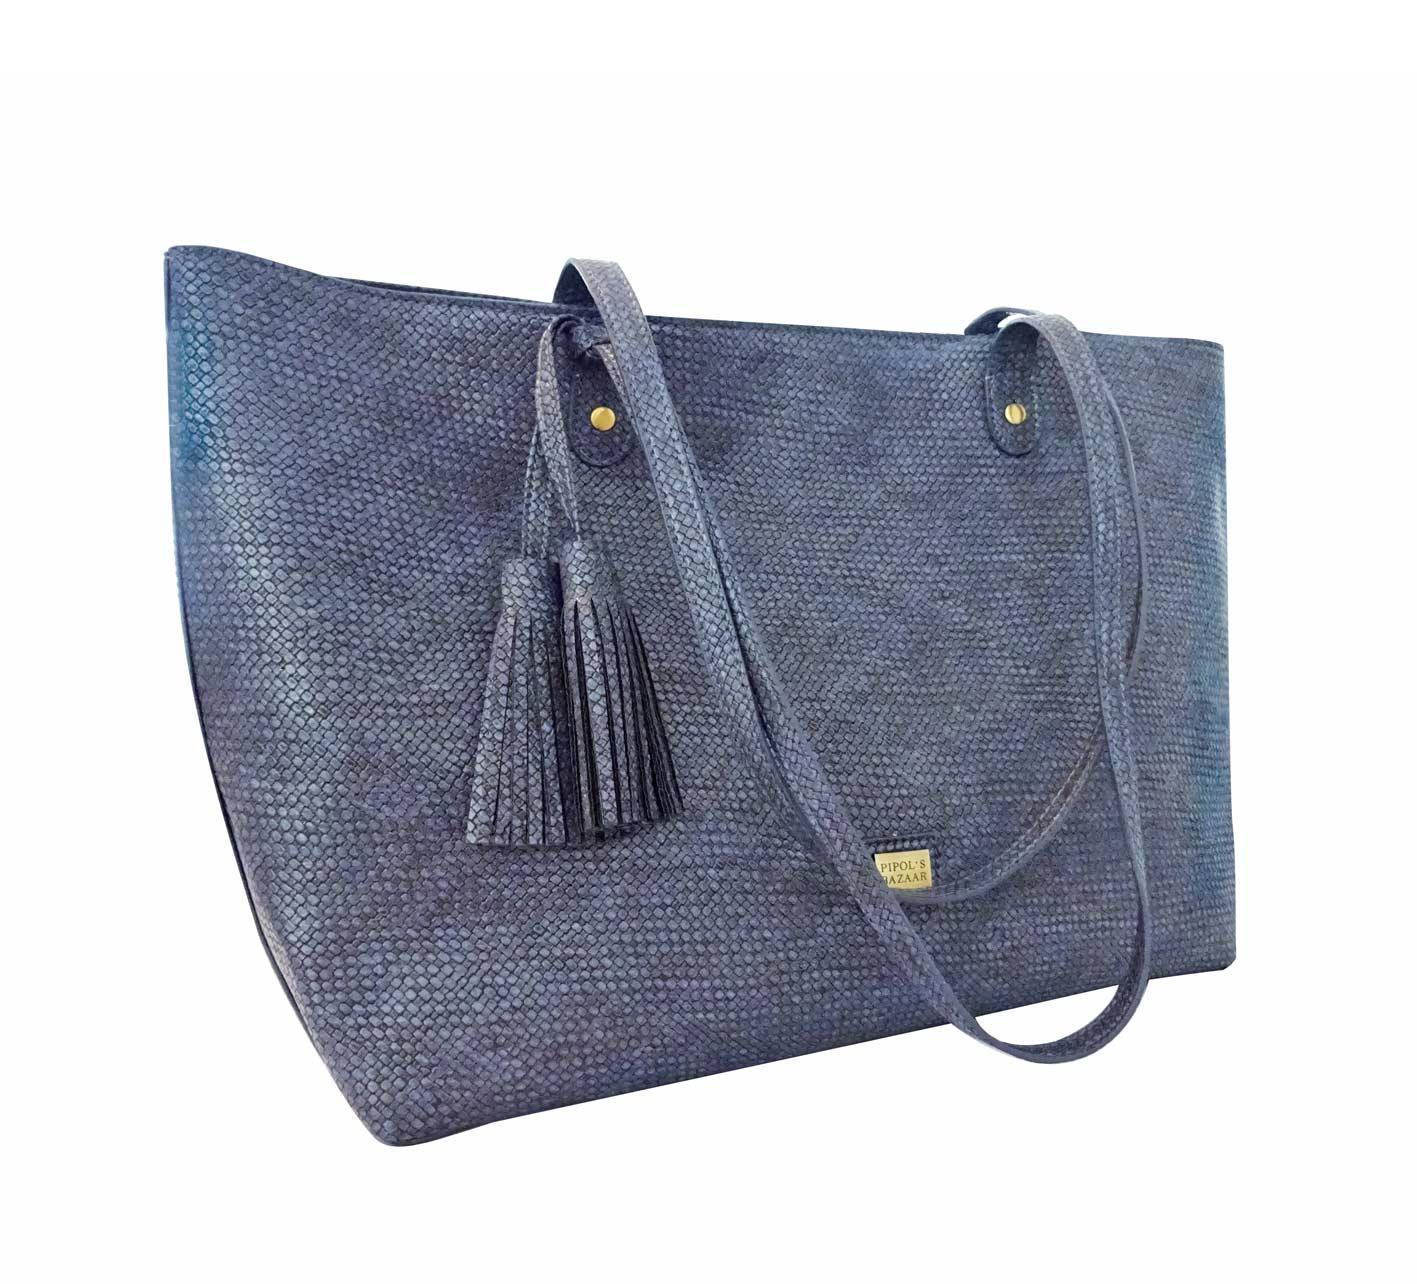 Pipols Bazaar - Stile Shopper Väska - Dauve - Rara Klaras 936f57347c589